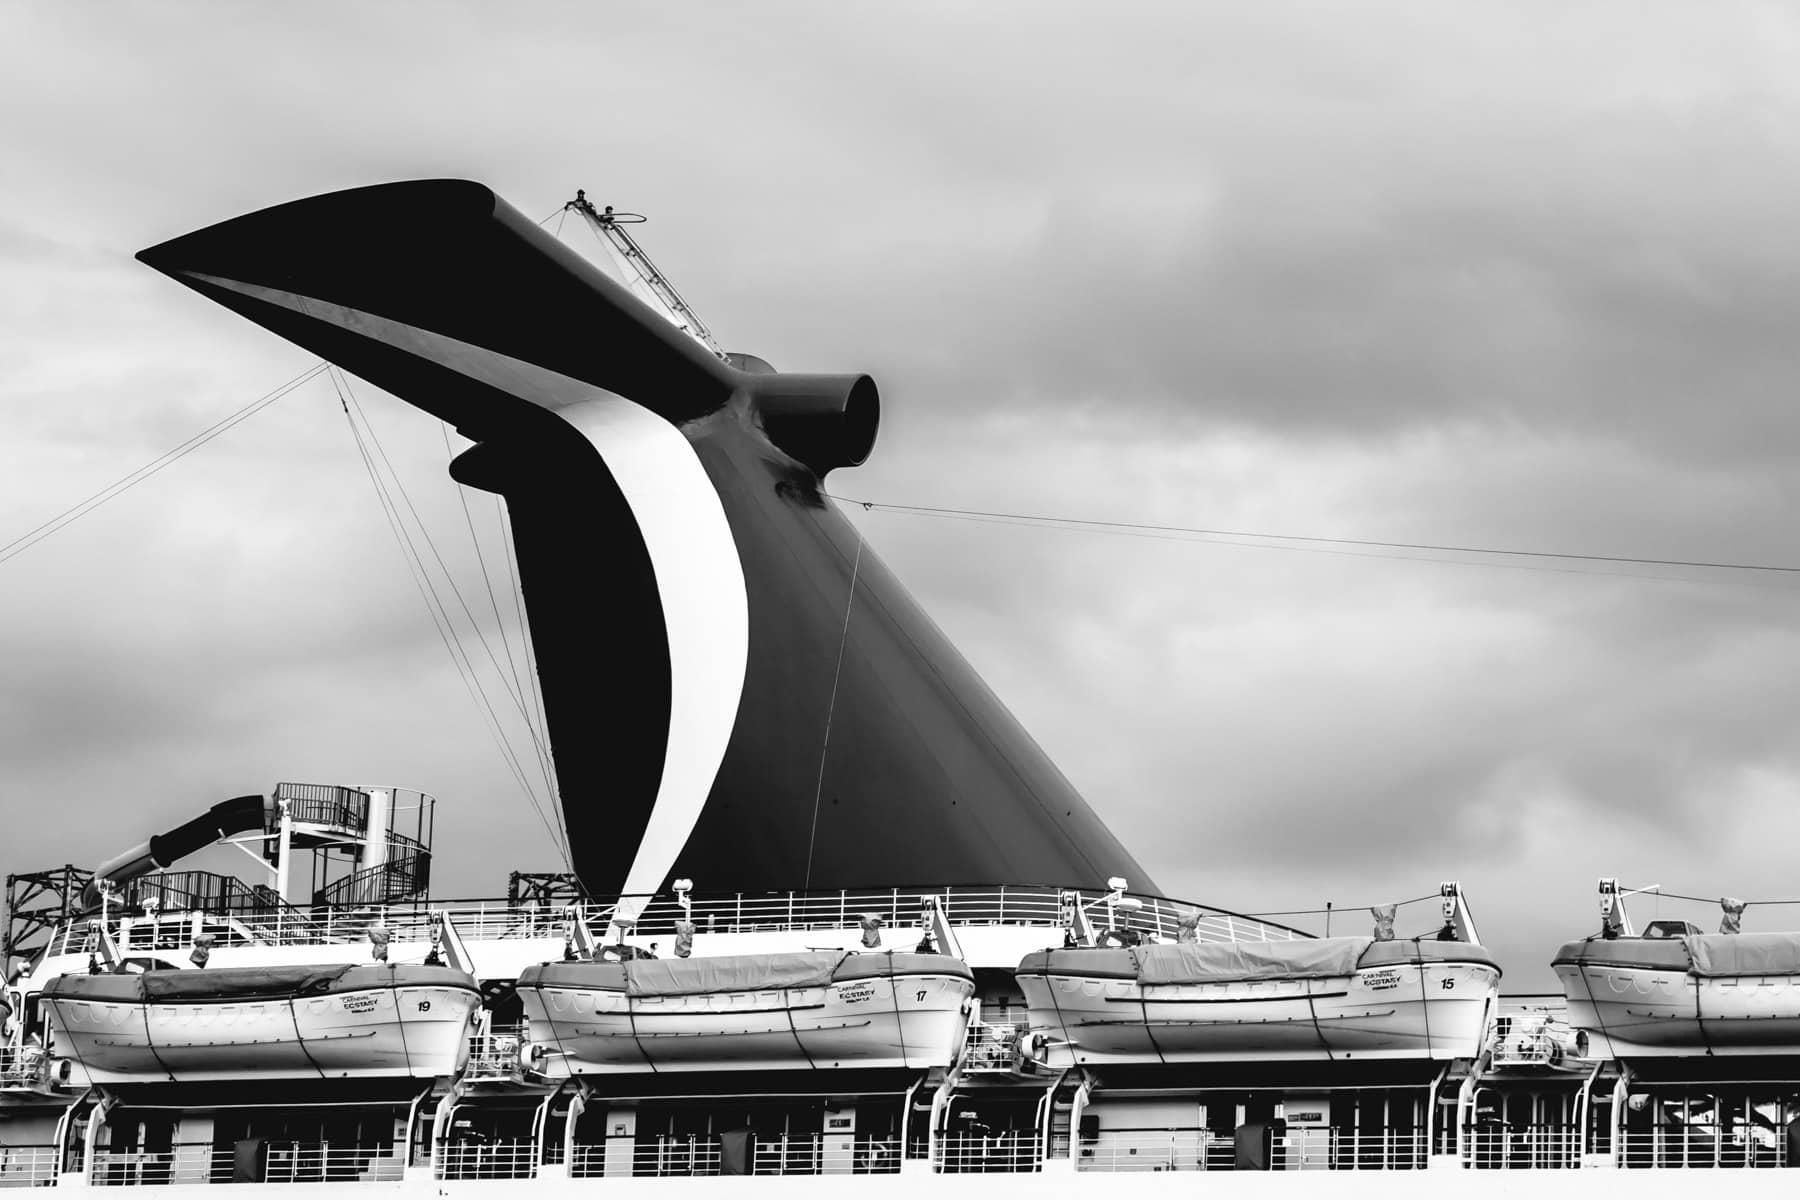 The cruise ship Carnival Ecstasy at the Port of Galveston, Texas.